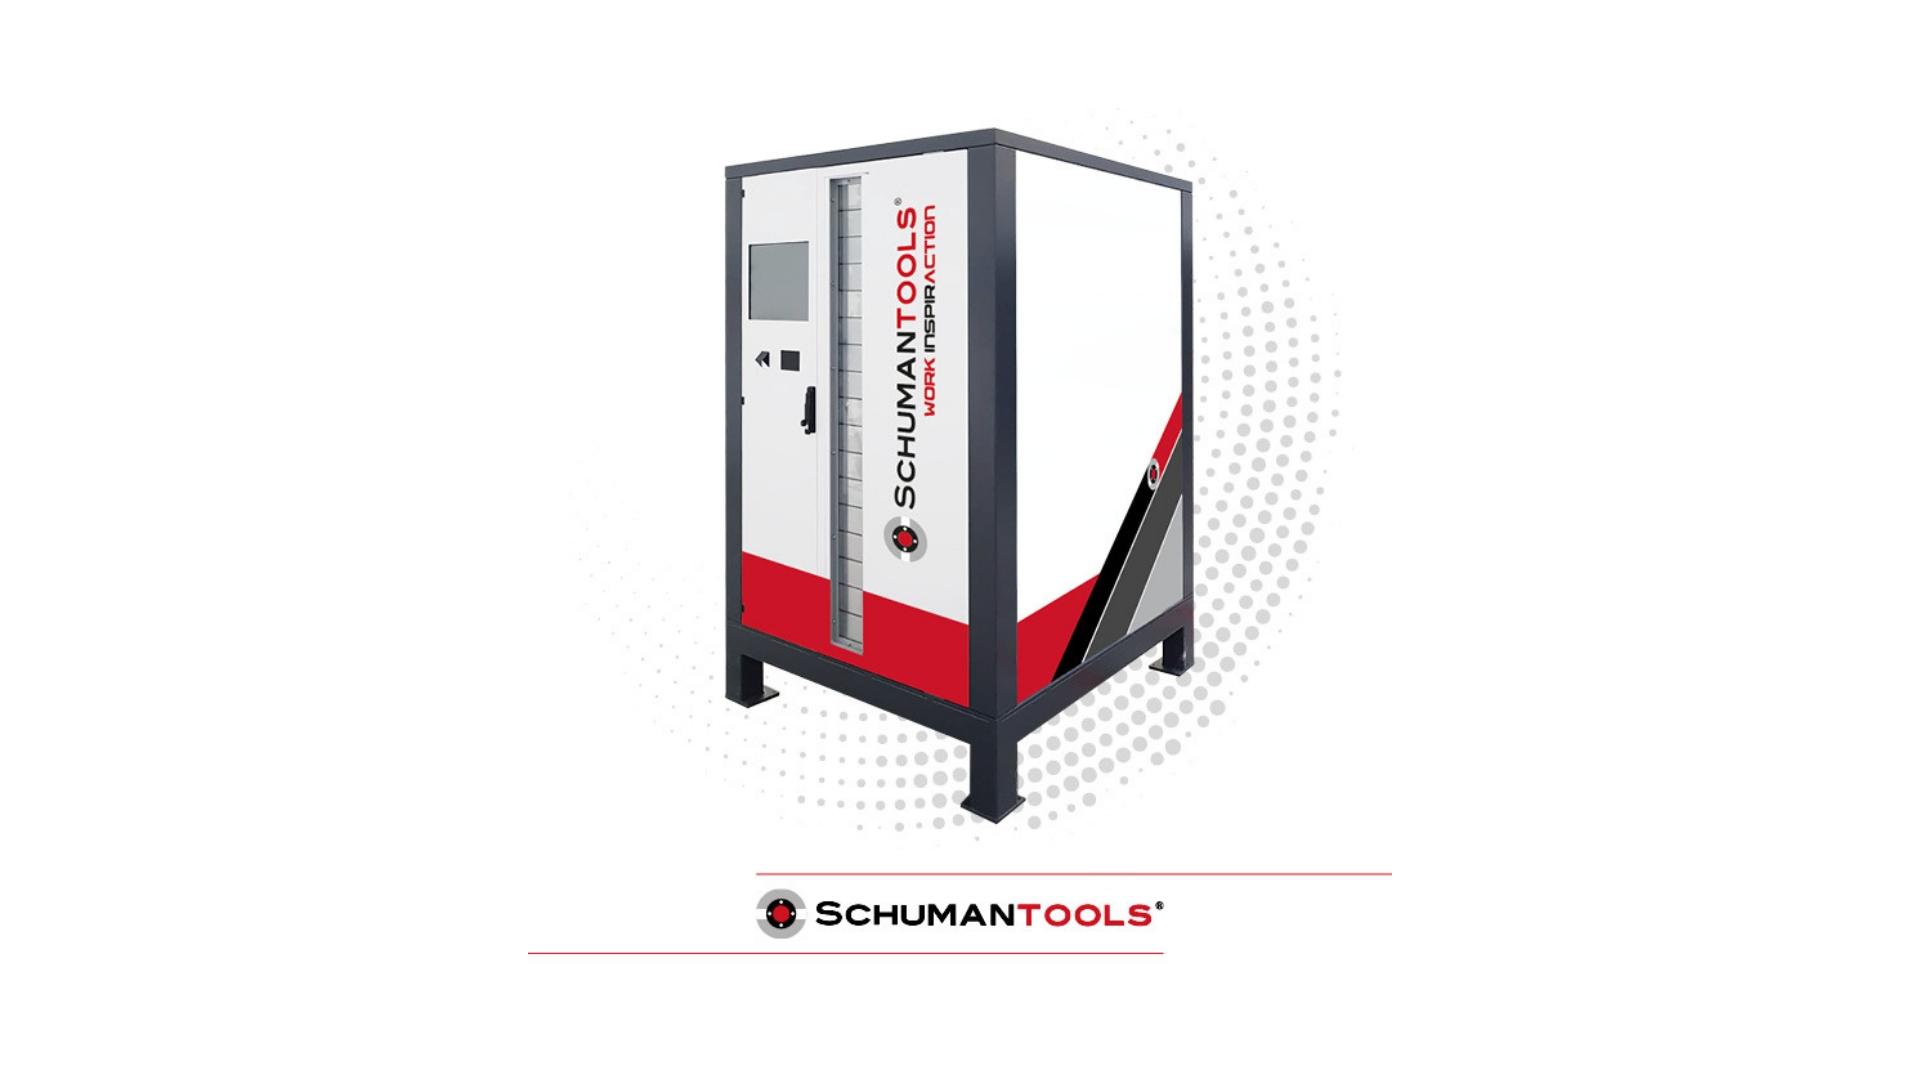 cassettiere smart magazzini automatici stools24